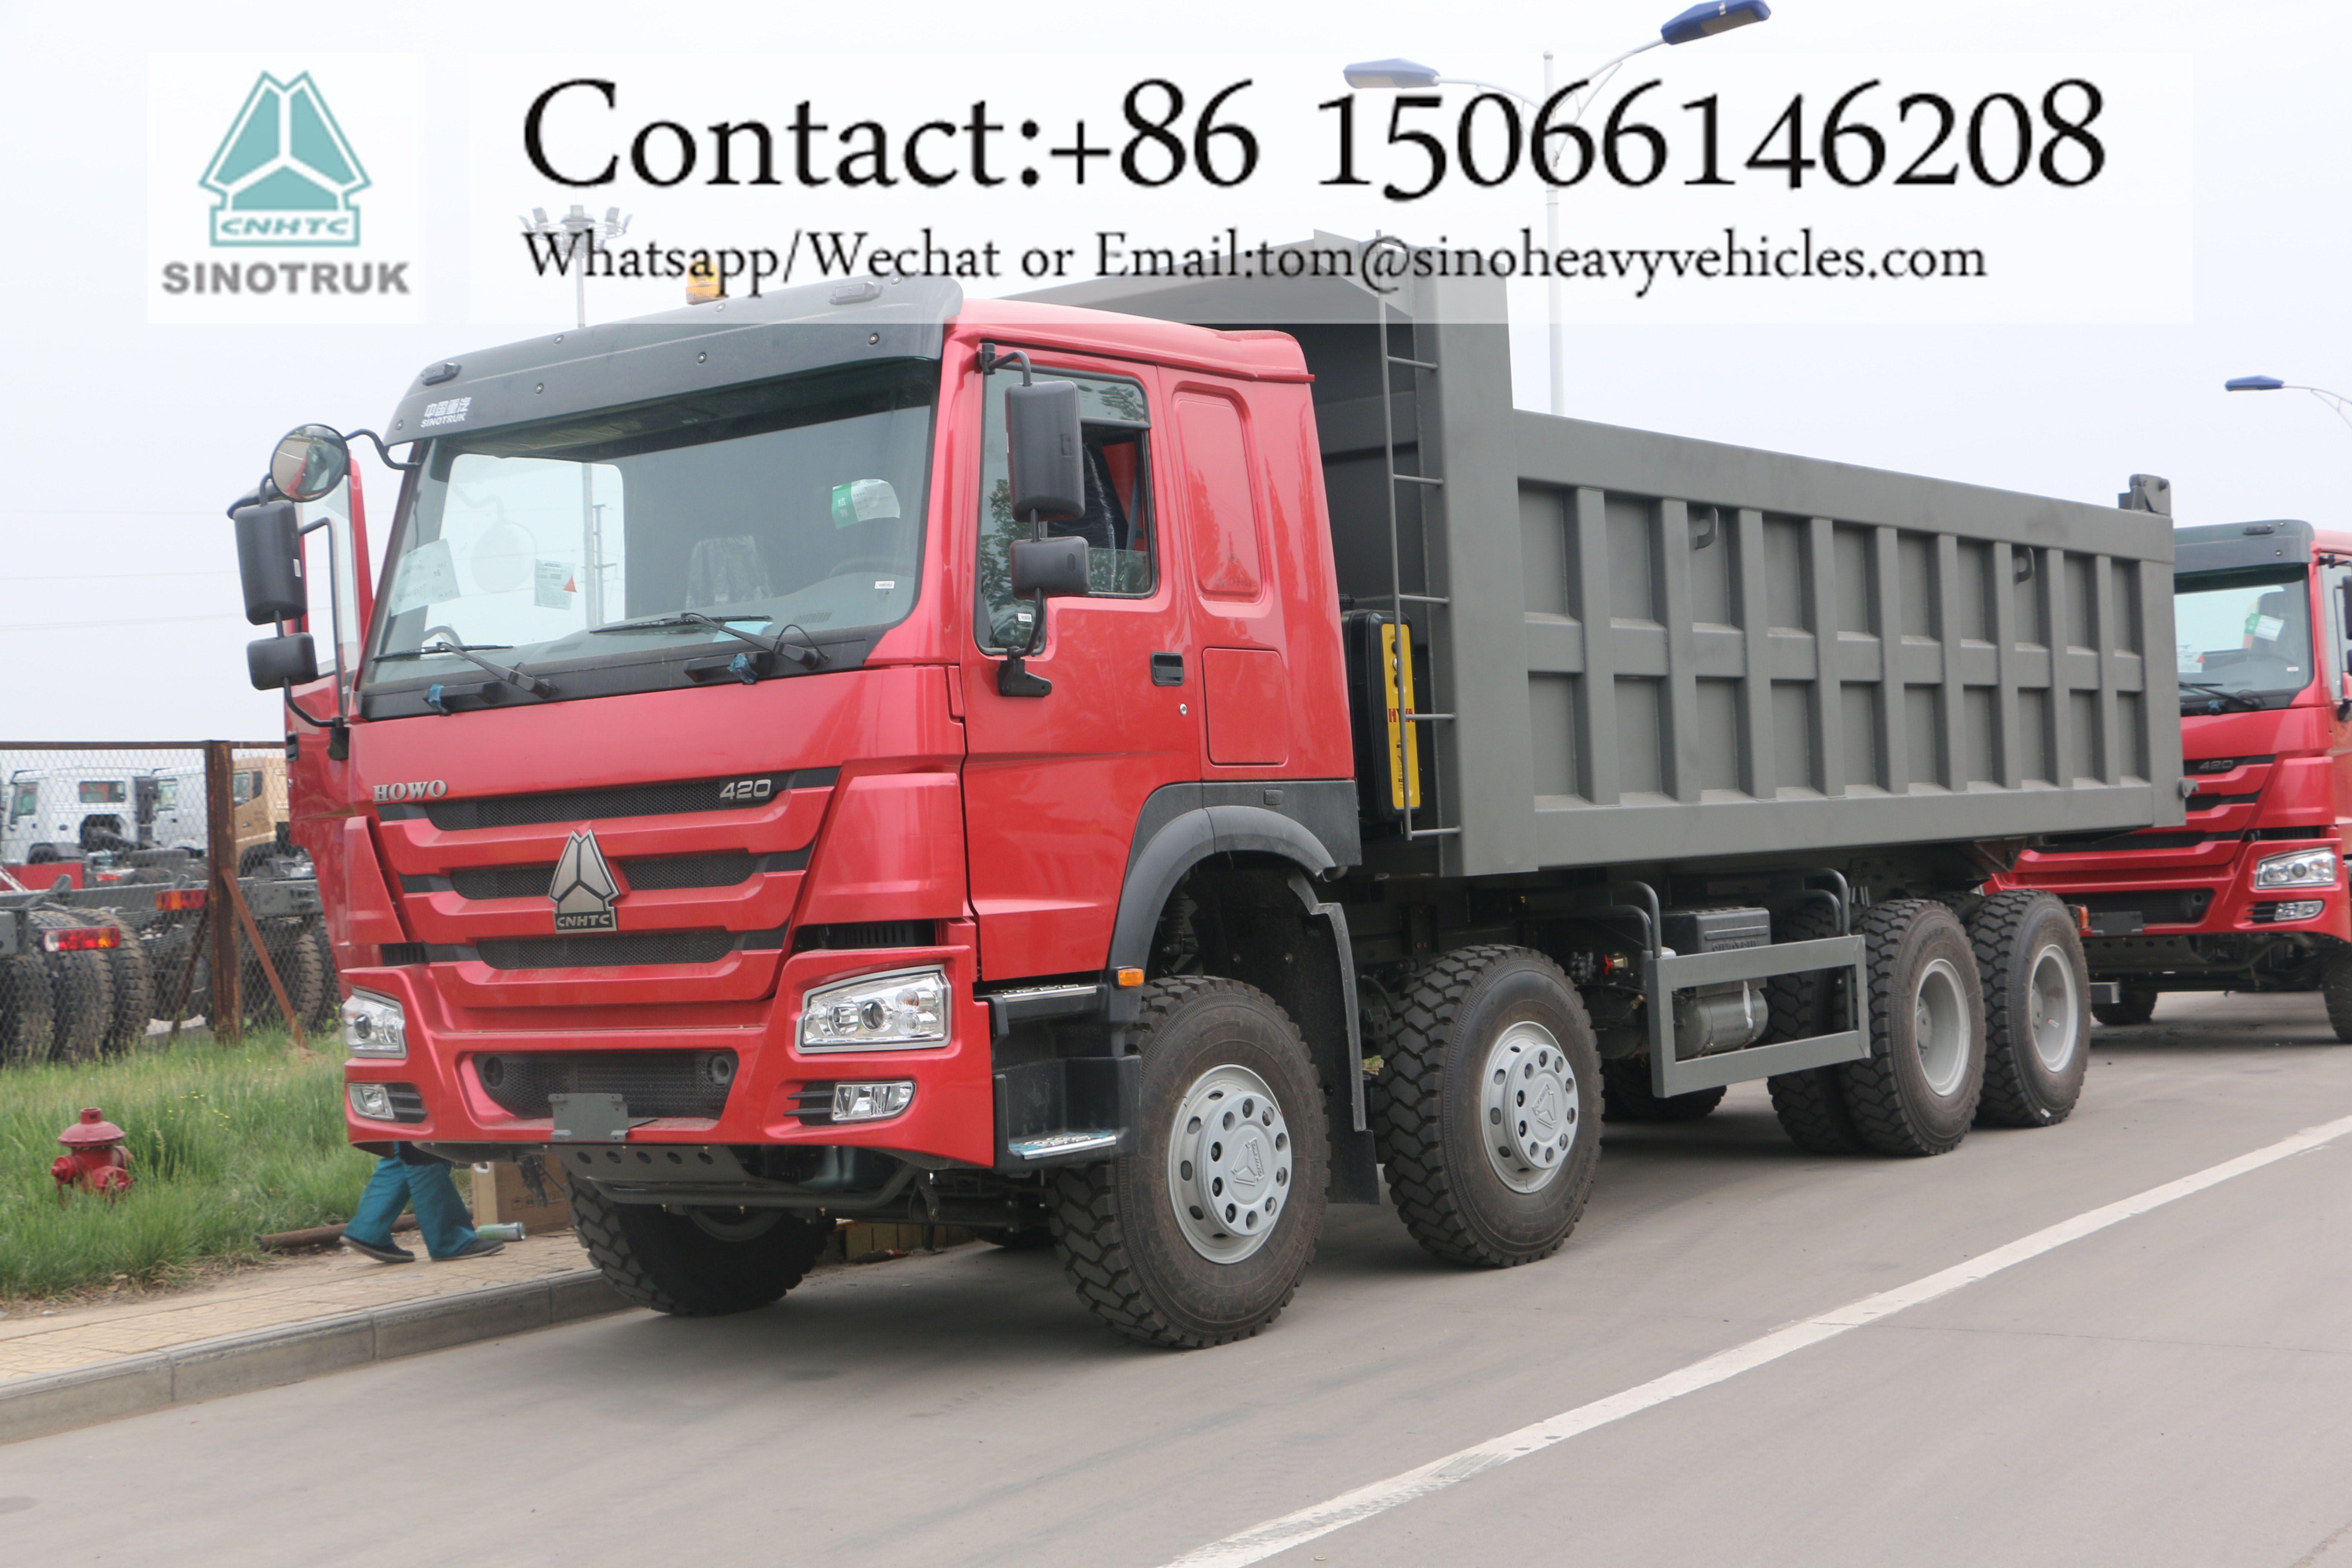 Howo 40 Cubic Meter Dump Truck 6x4 - Buy Dump Truck,Howo